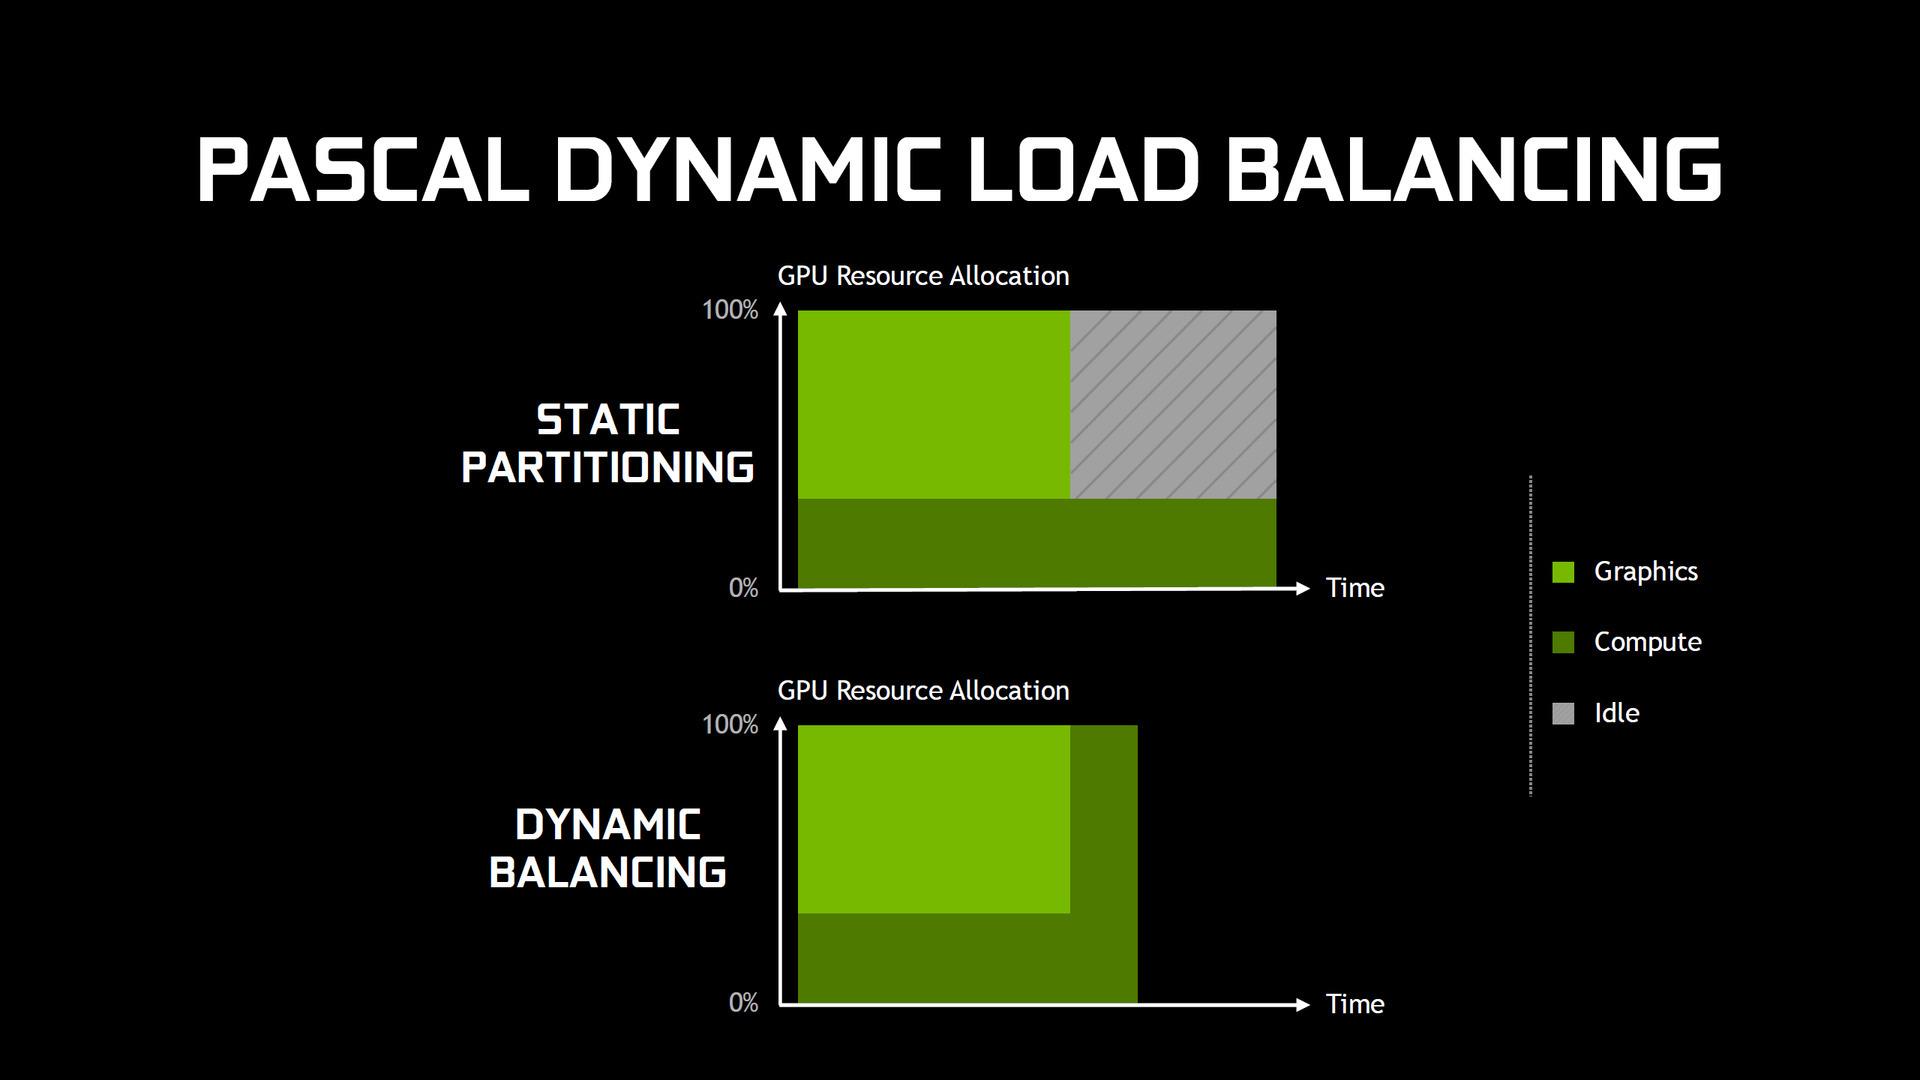 Pascalでは並列処理の効率性が向上